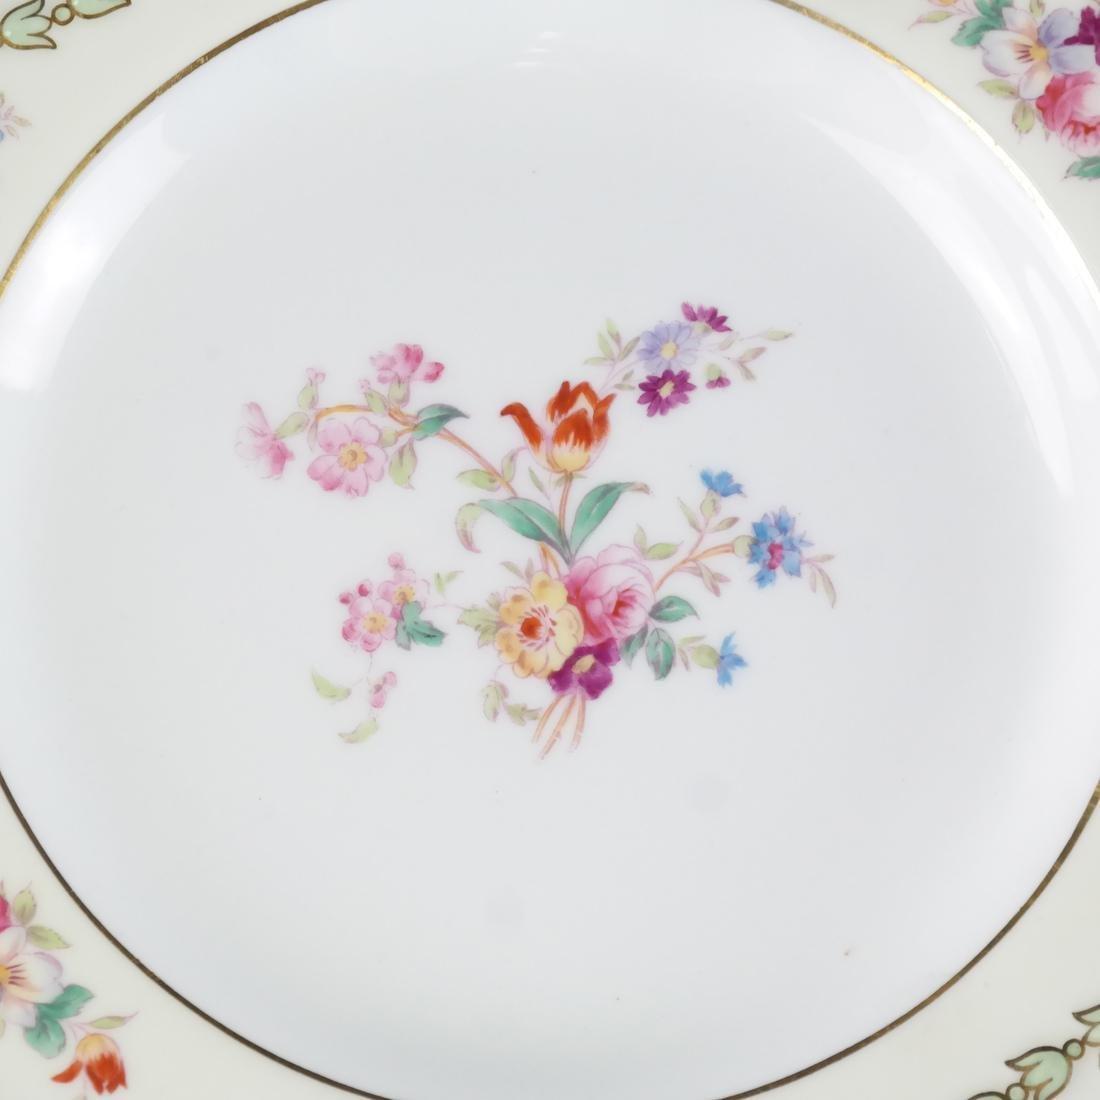 12 Wedgwood Porcelain Luncheon Plates - 3